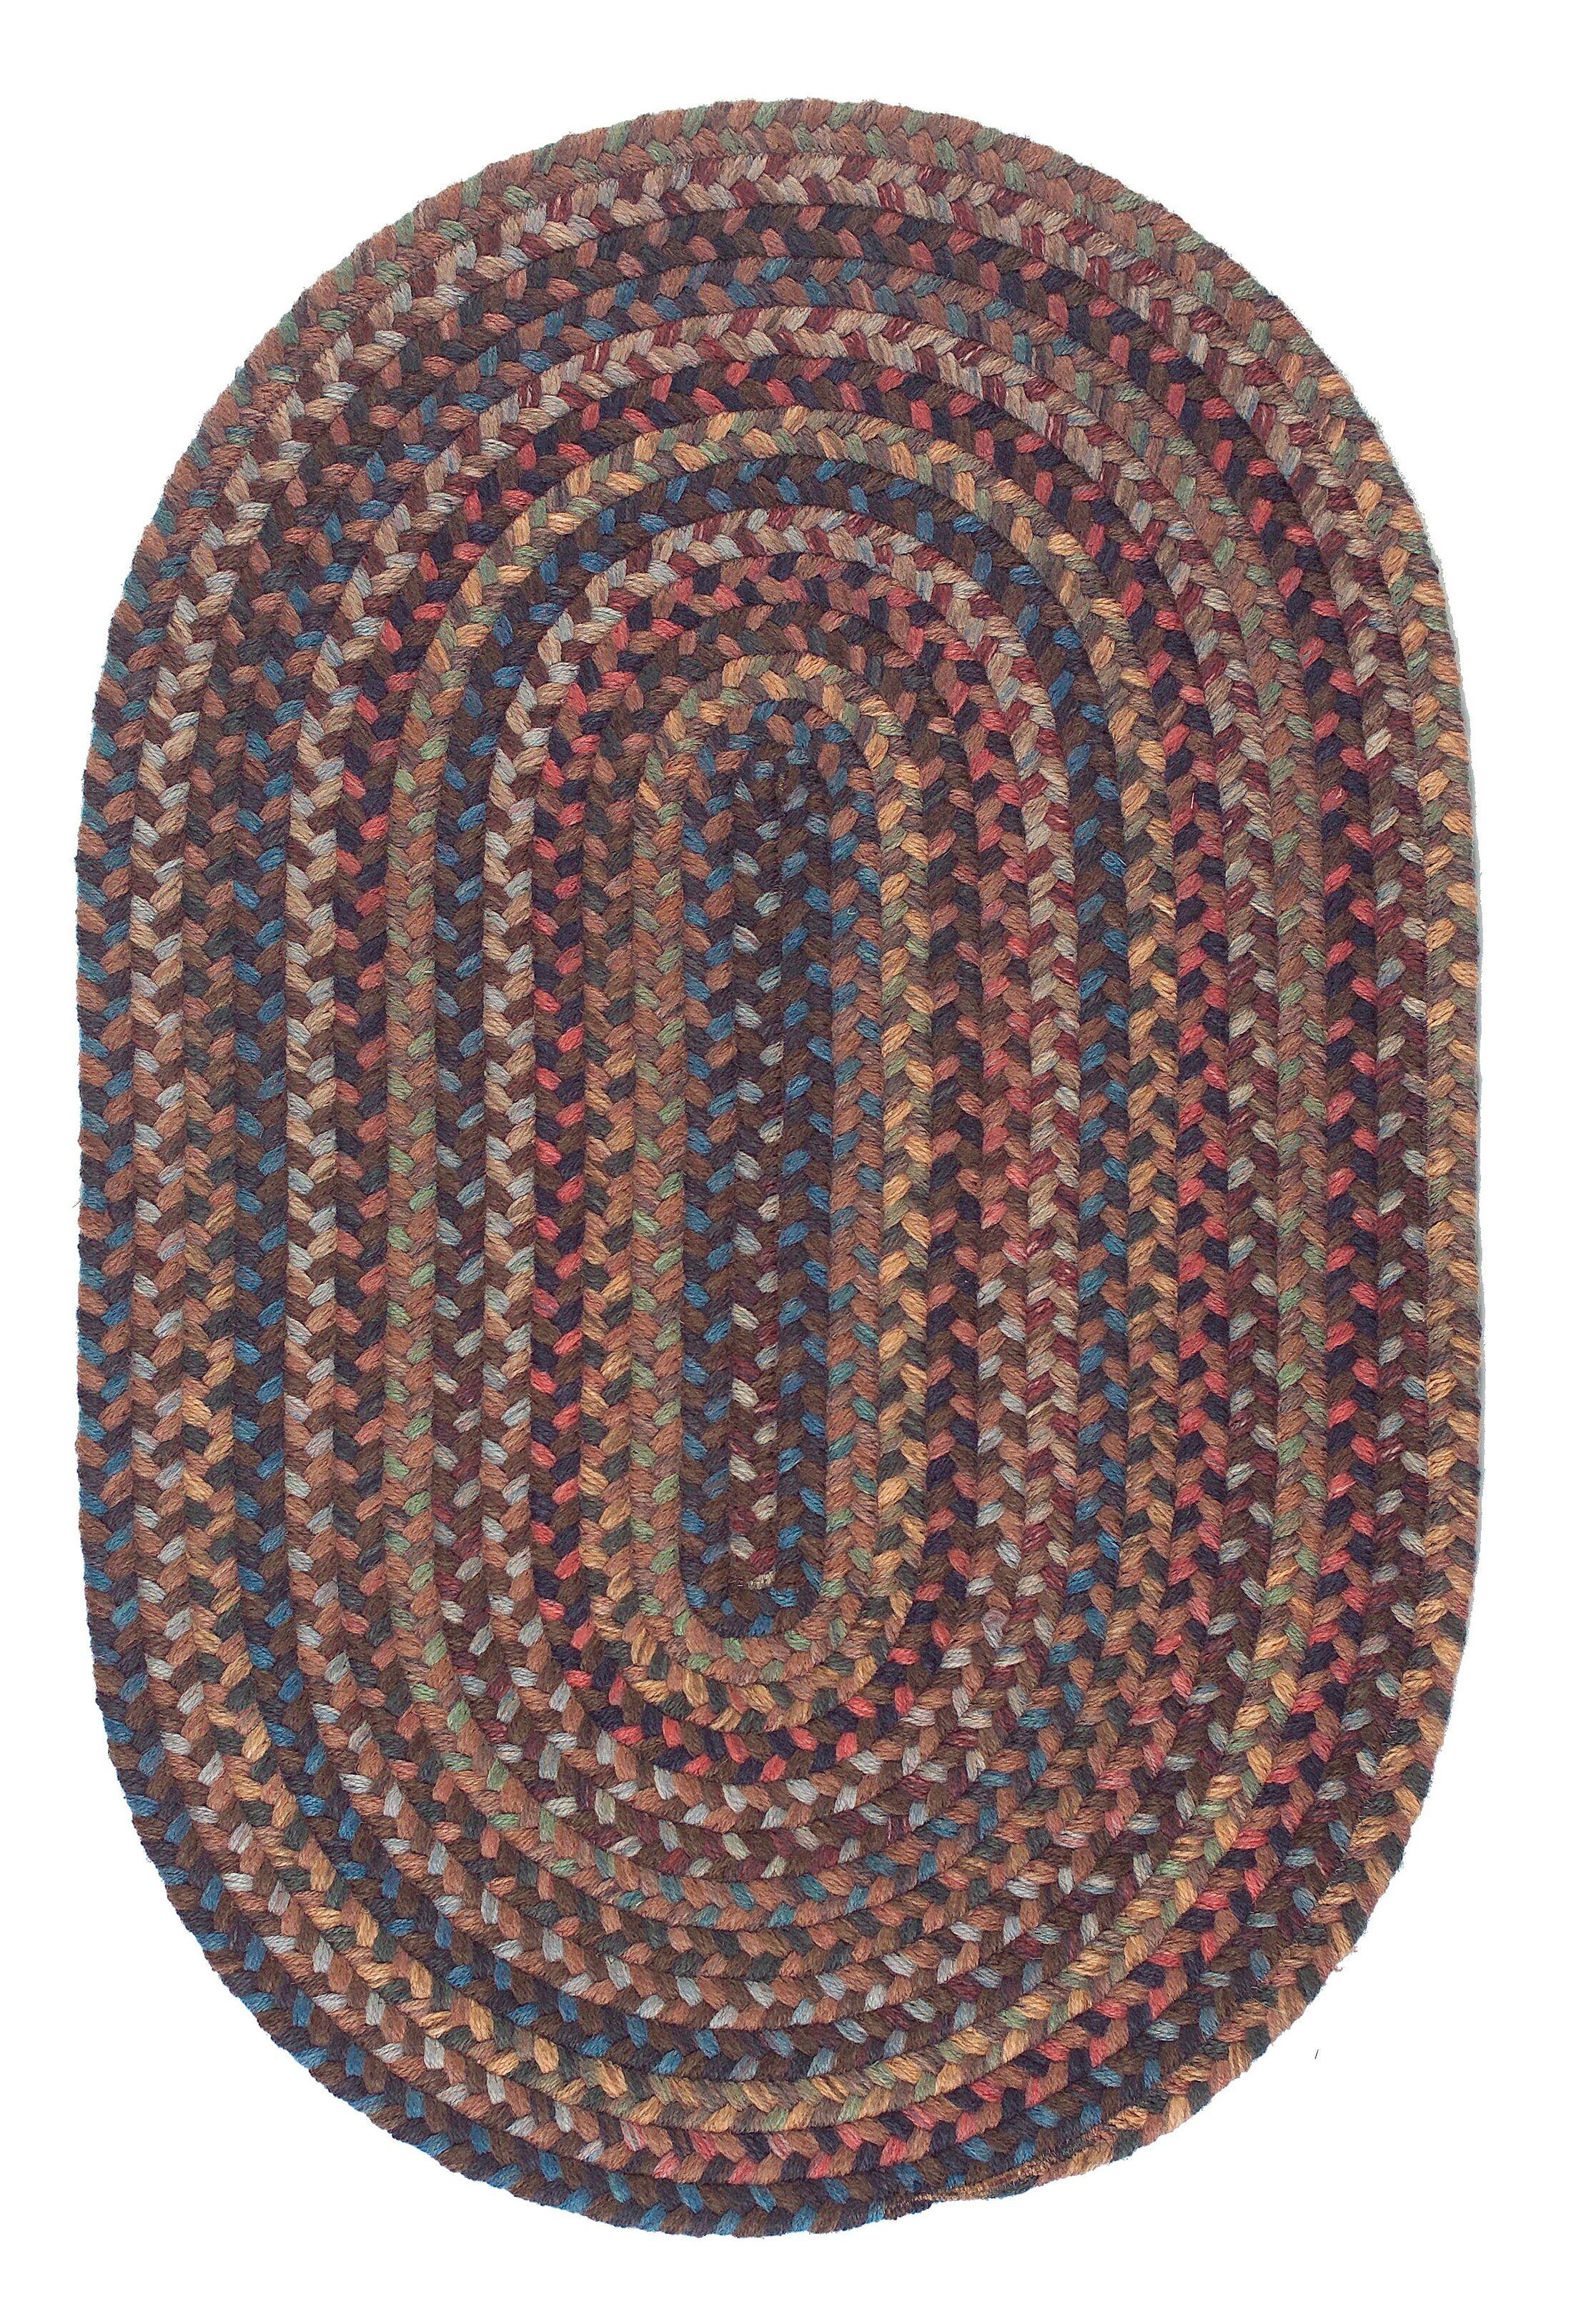 Oak Harbour Dusk Area Rug Rug Size: Oval 12' x 15'